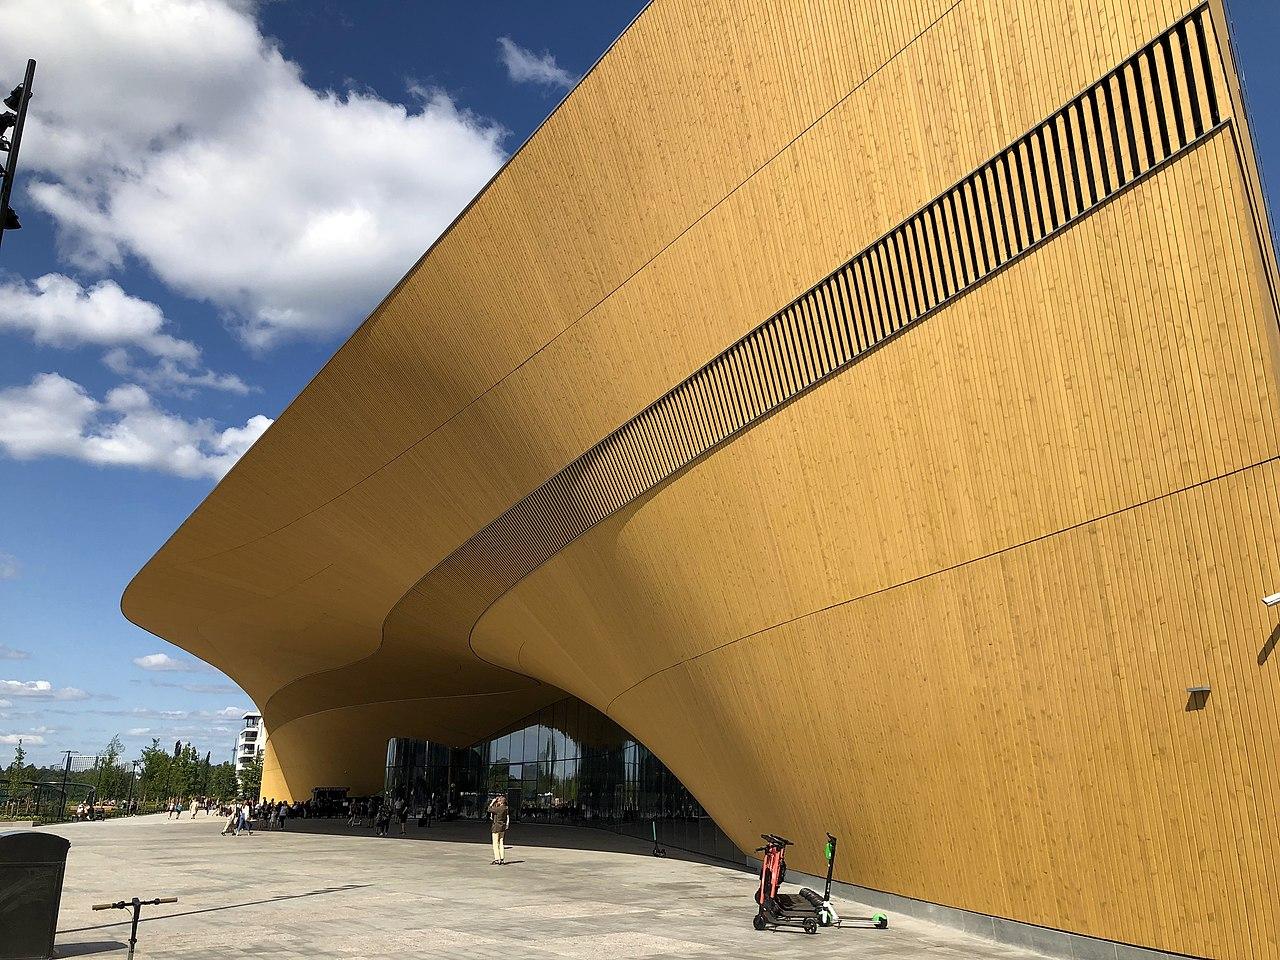 側面看赫爾辛基中央圖書館Oodi。(Vadelmavene/Wikimedia commons)